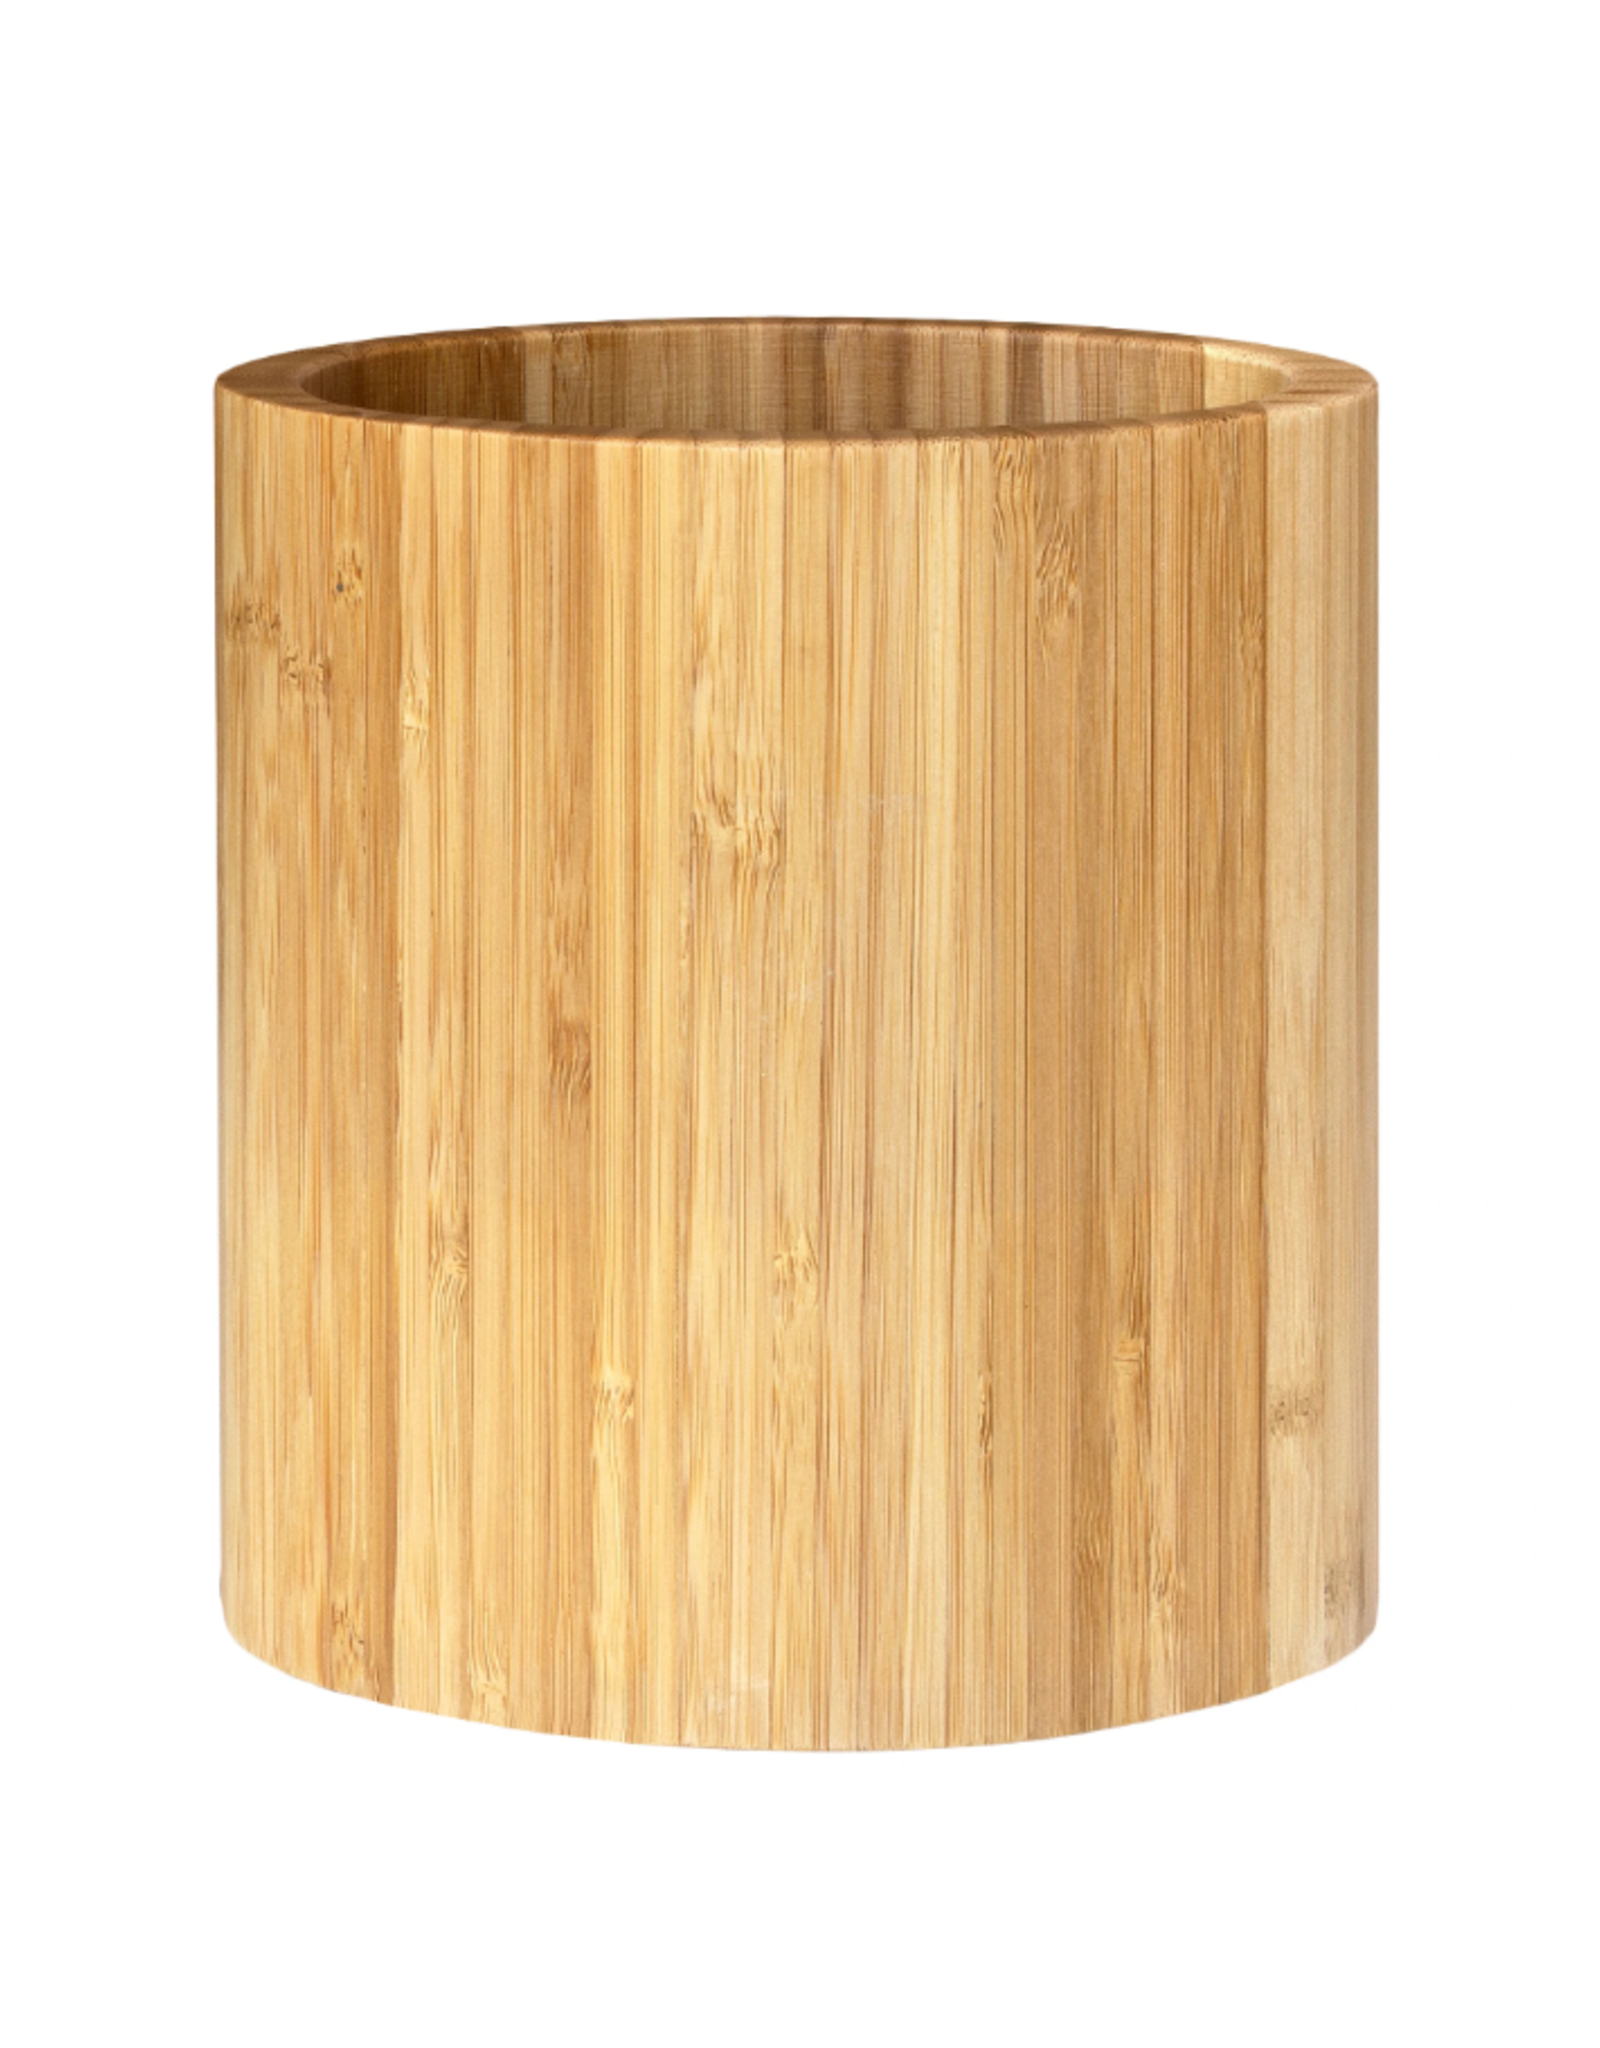 Totally Bamboo Bamboo Oval Tool Crock